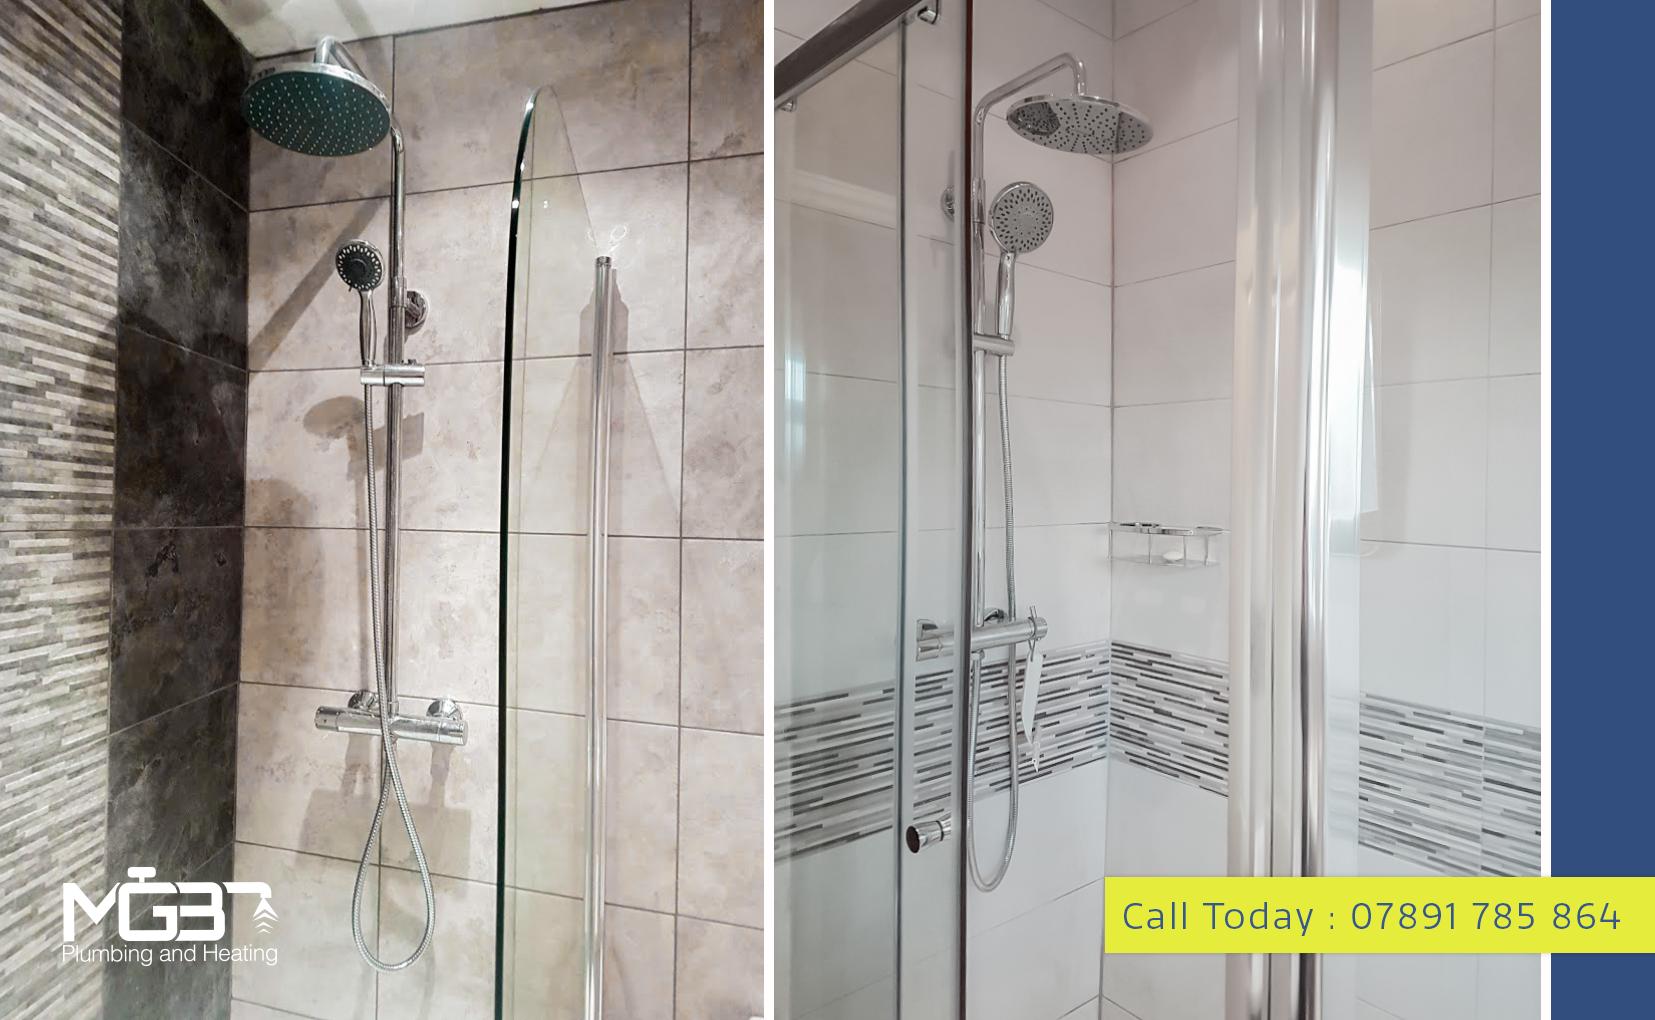 Shower Installation by MGB